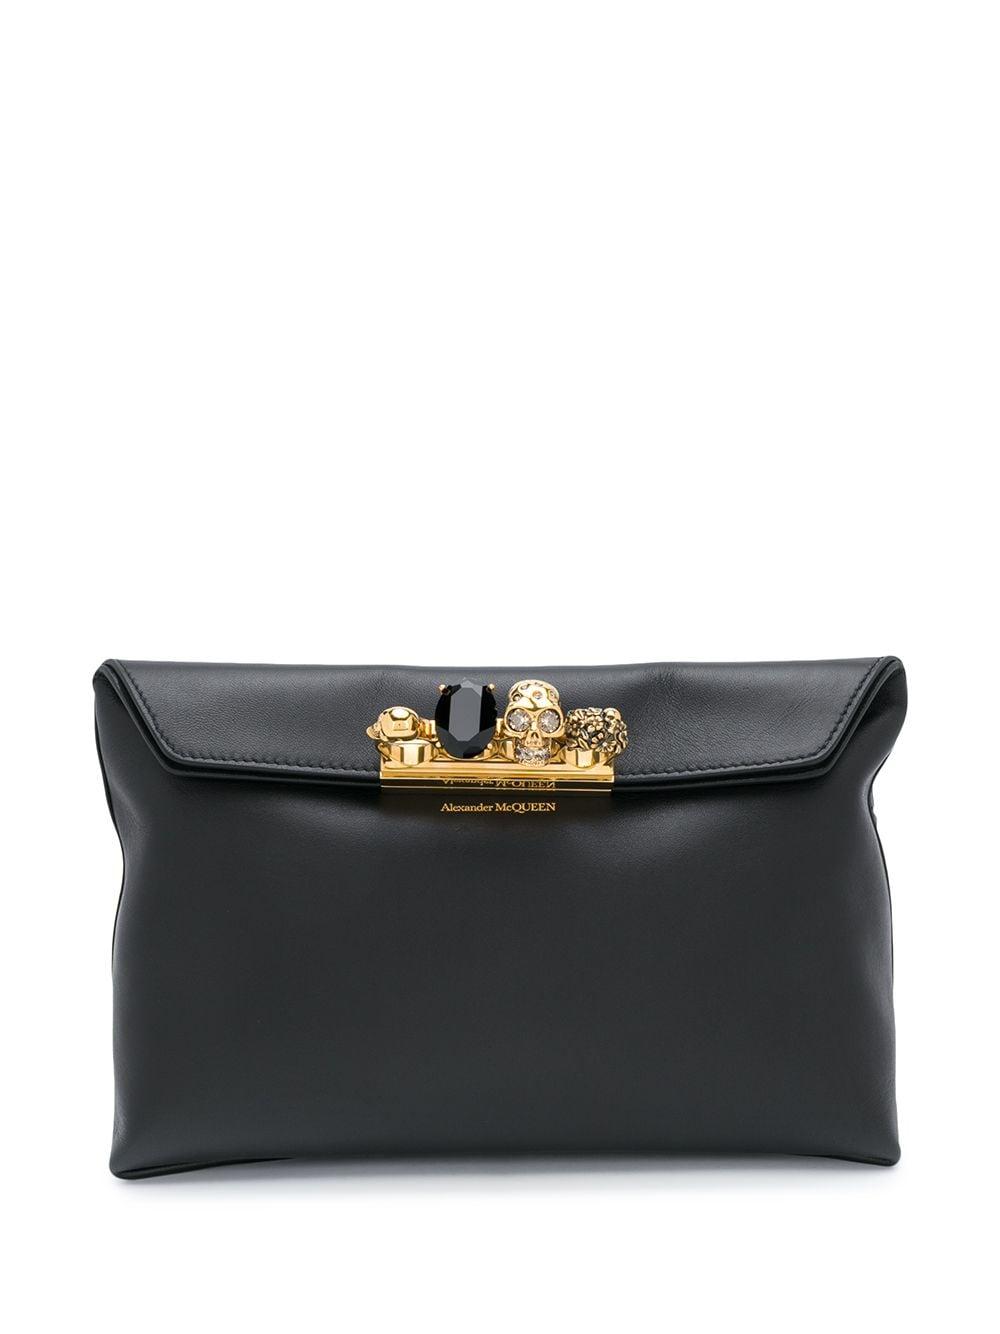 Four Ring Leather Mini Bag